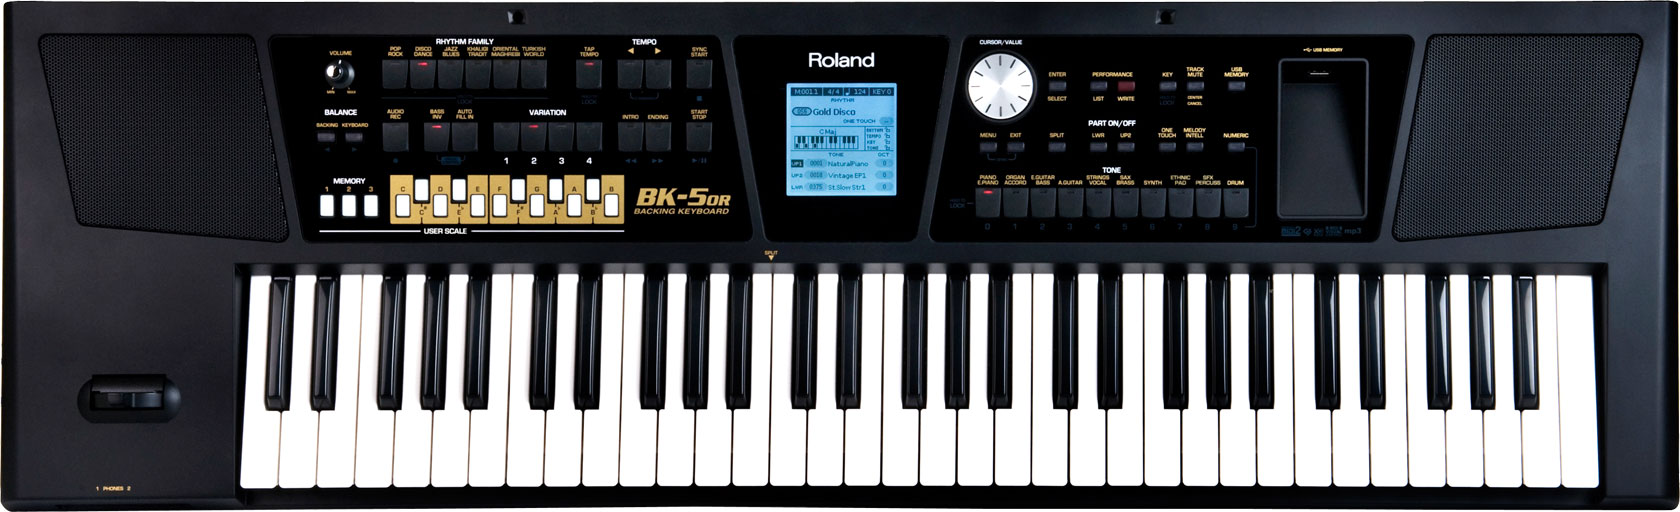 BK-5 OR | Backing Keyboard - Roland